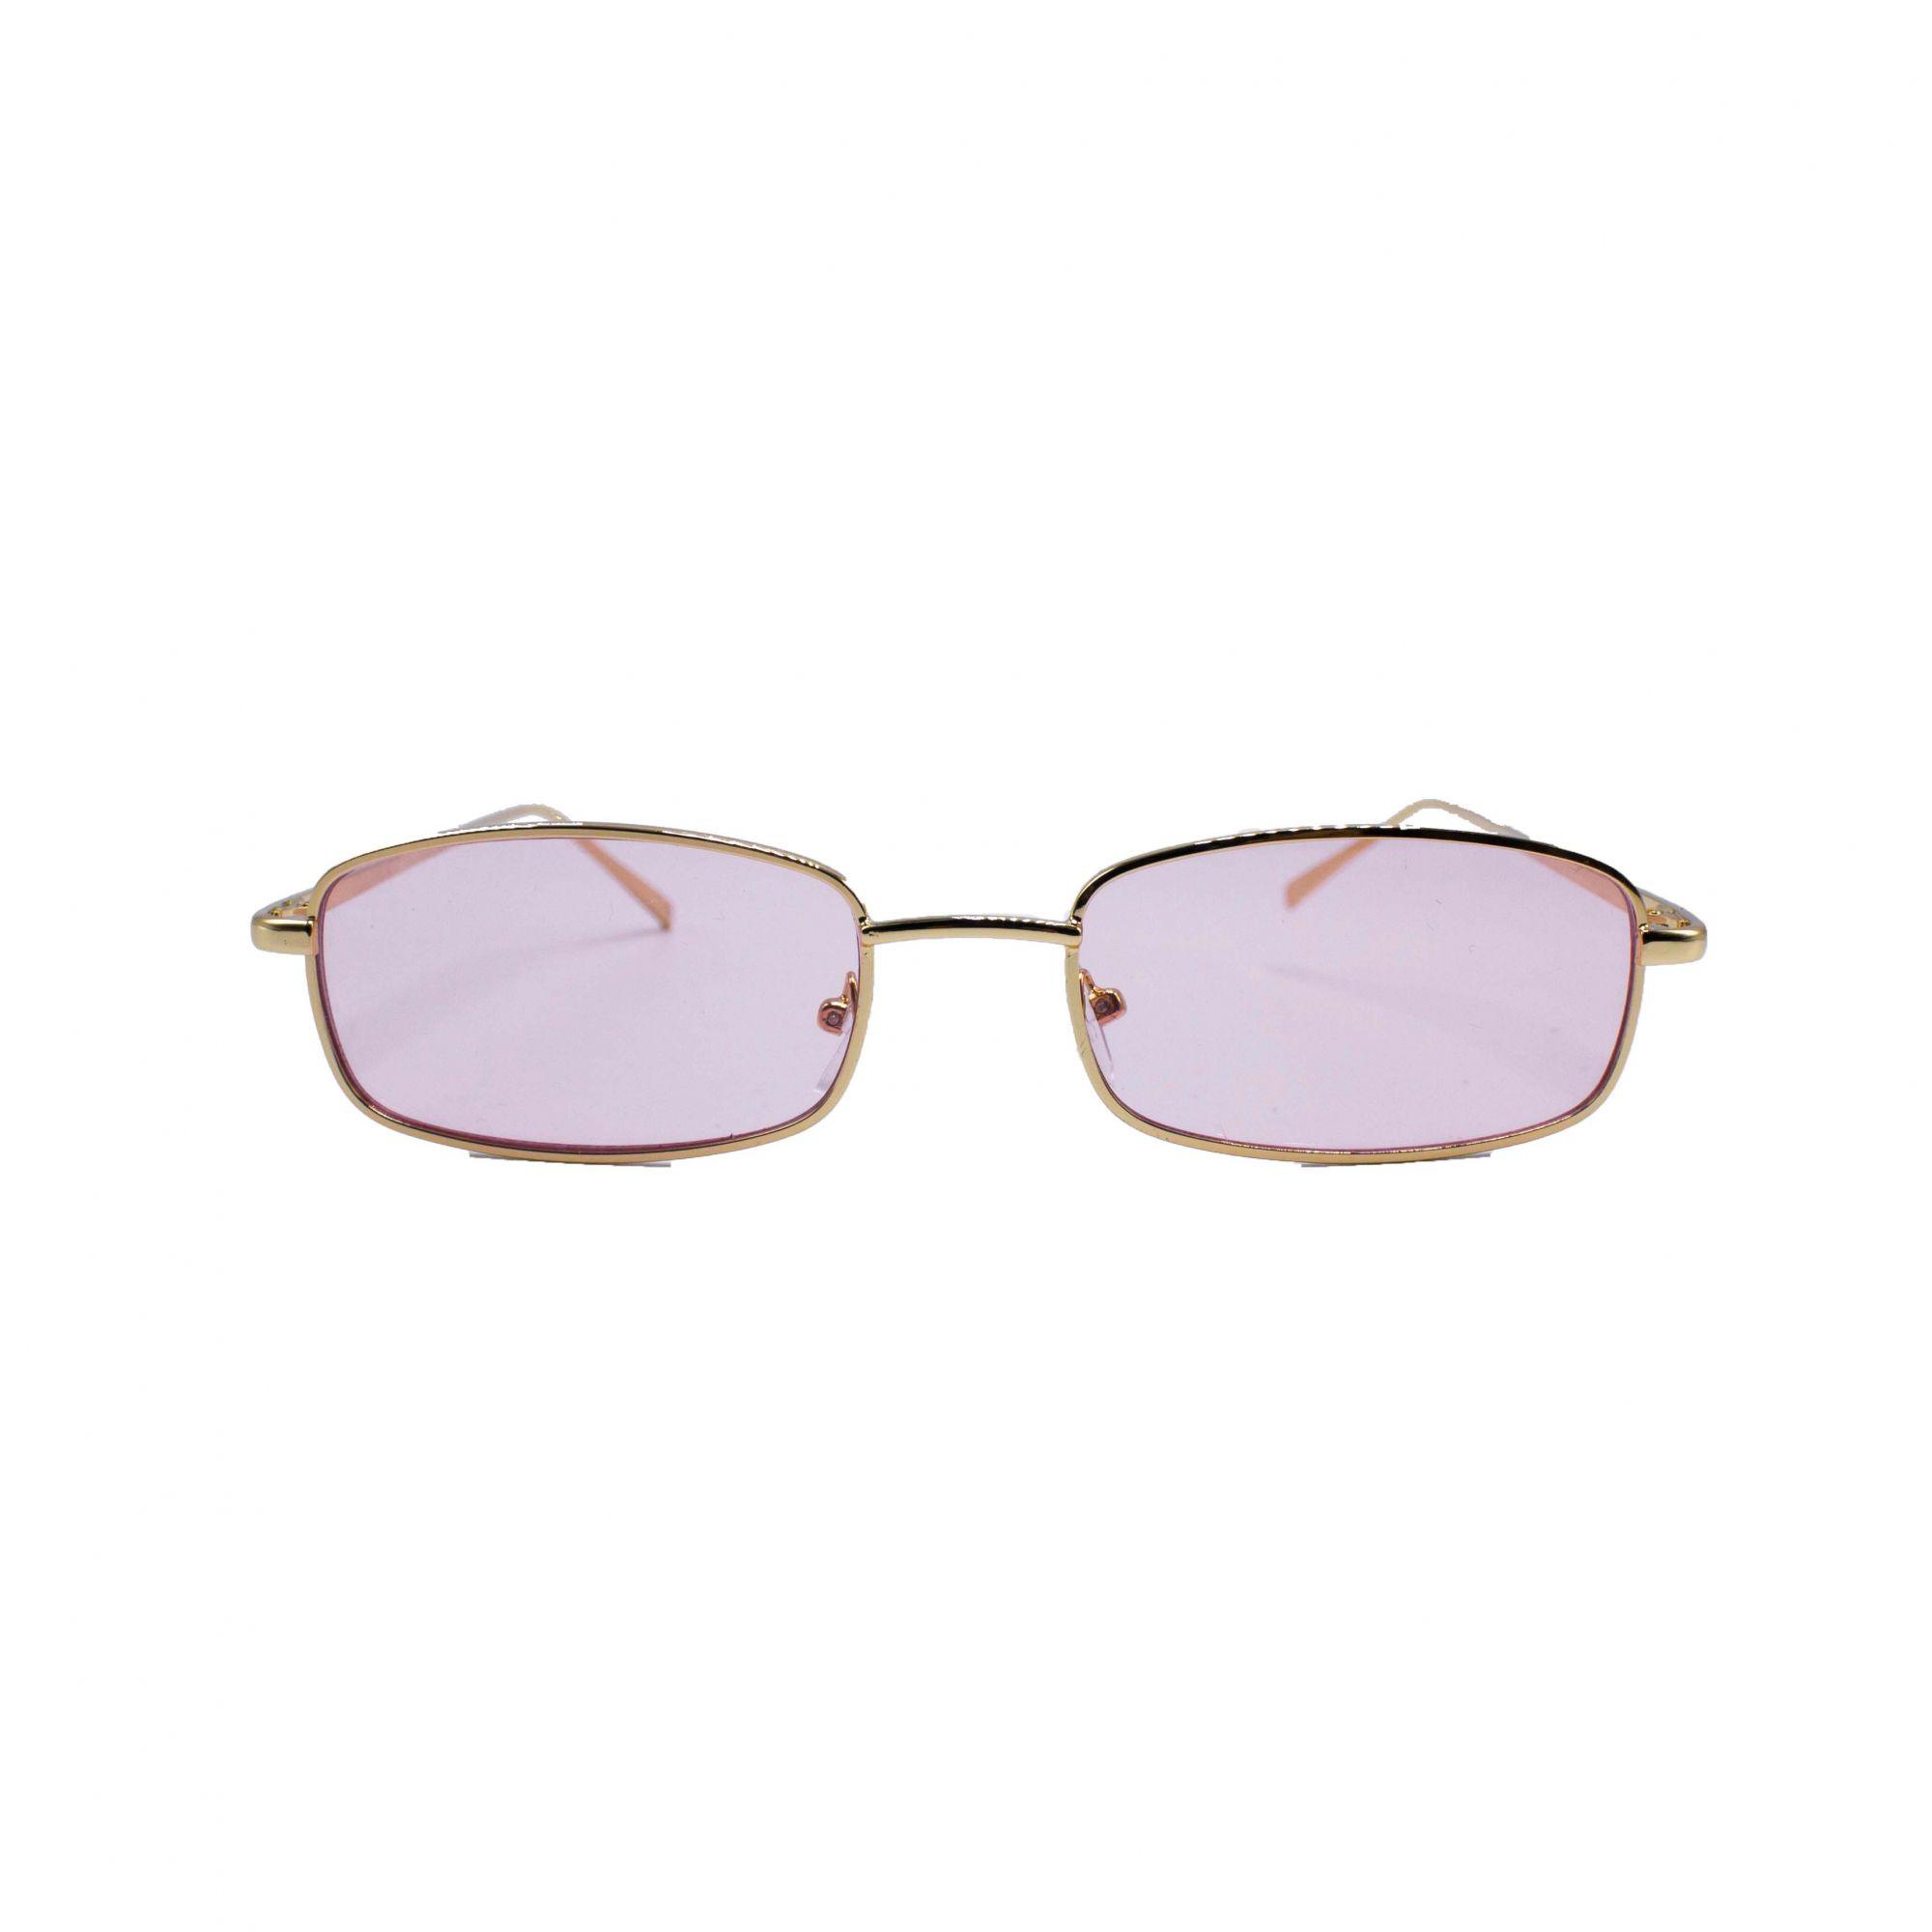 e484f51bb9f9f Óculos Vintage